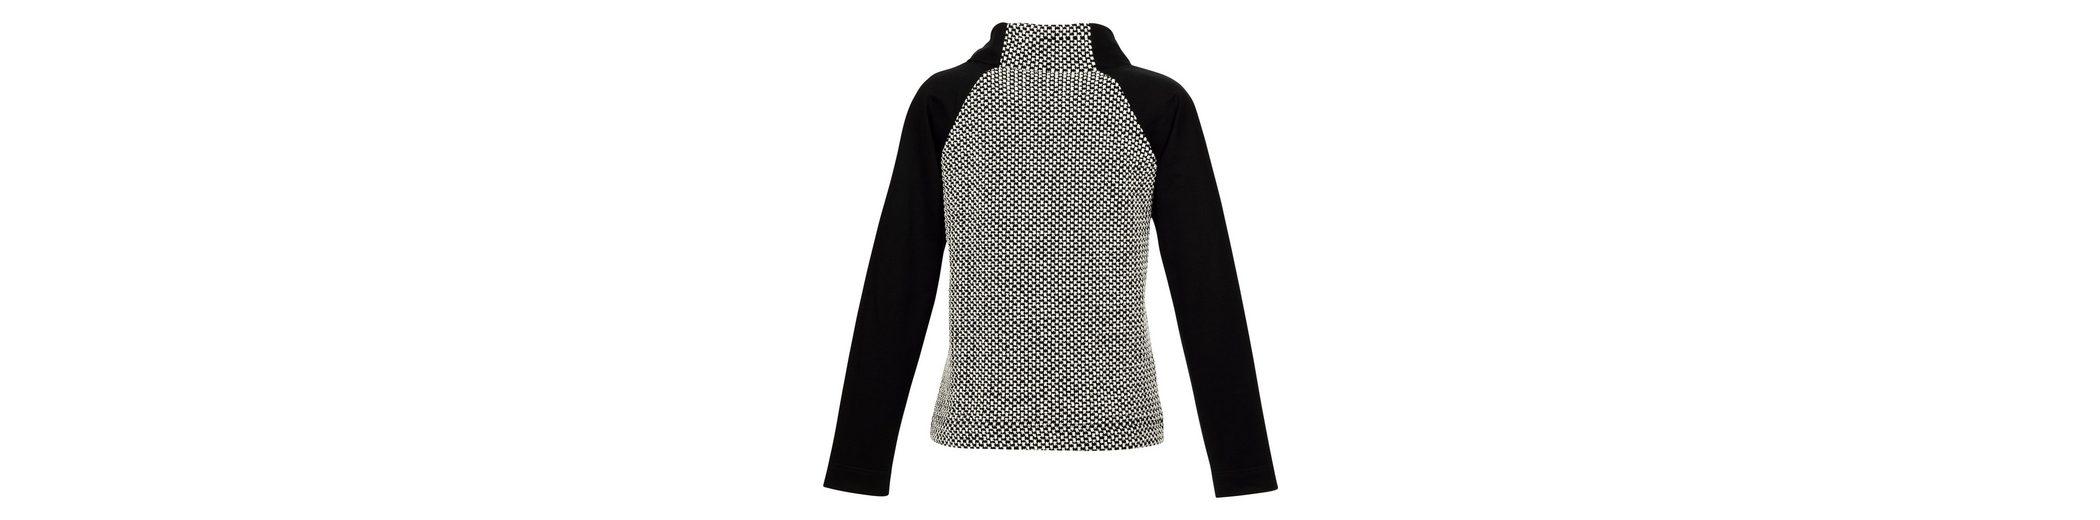 TRIGEMA Stehkragen Sweater Stehkragen TRIGEMA Sweater x0xf4wnX